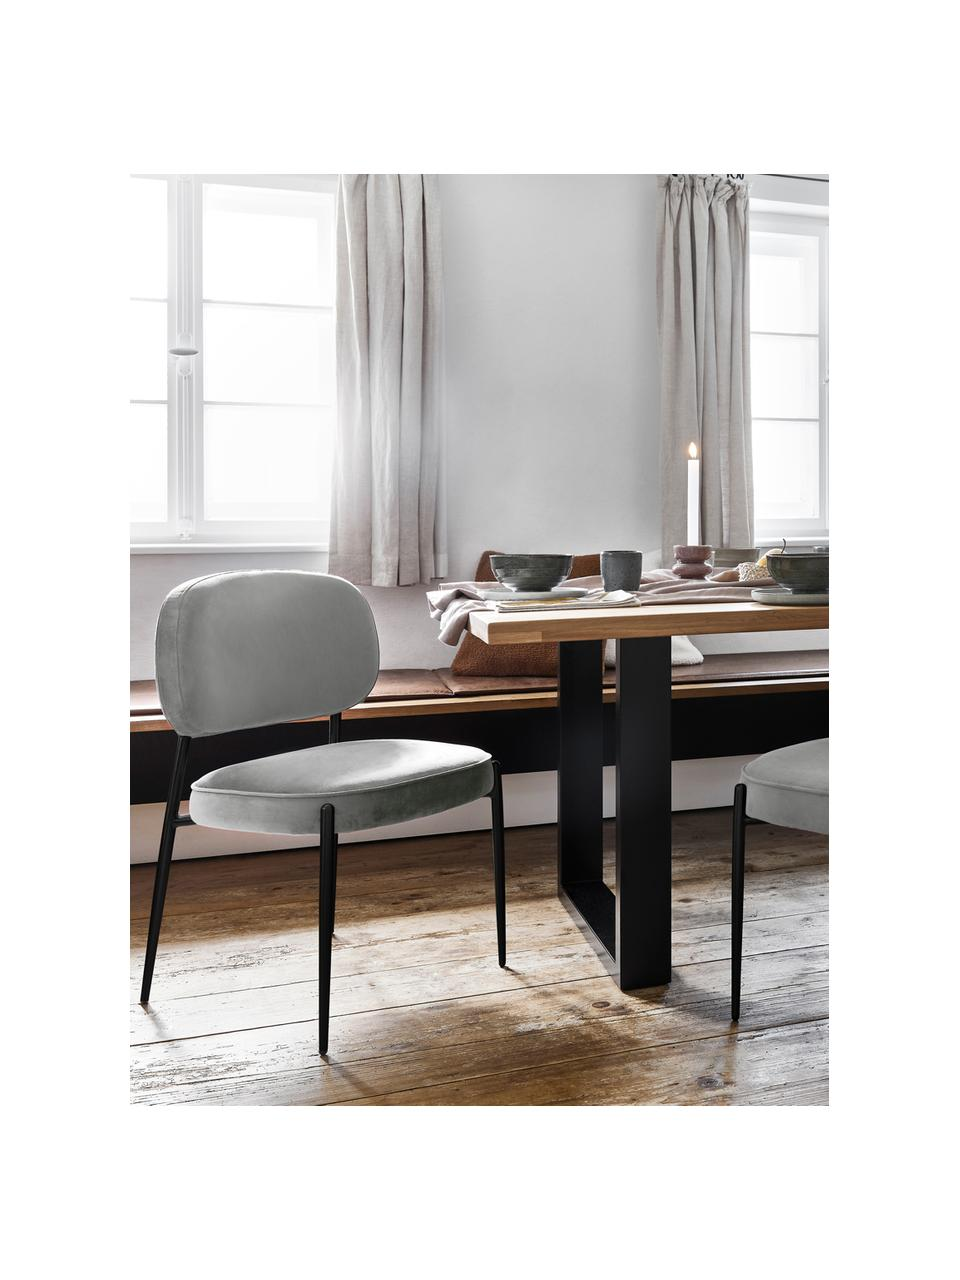 Sedia imbottita in velluto Viggo, Rivestimento: velluto (poliestere) Con , Velluto grigio Gambe: nero, Larg. 49 x Prof. 66 cm